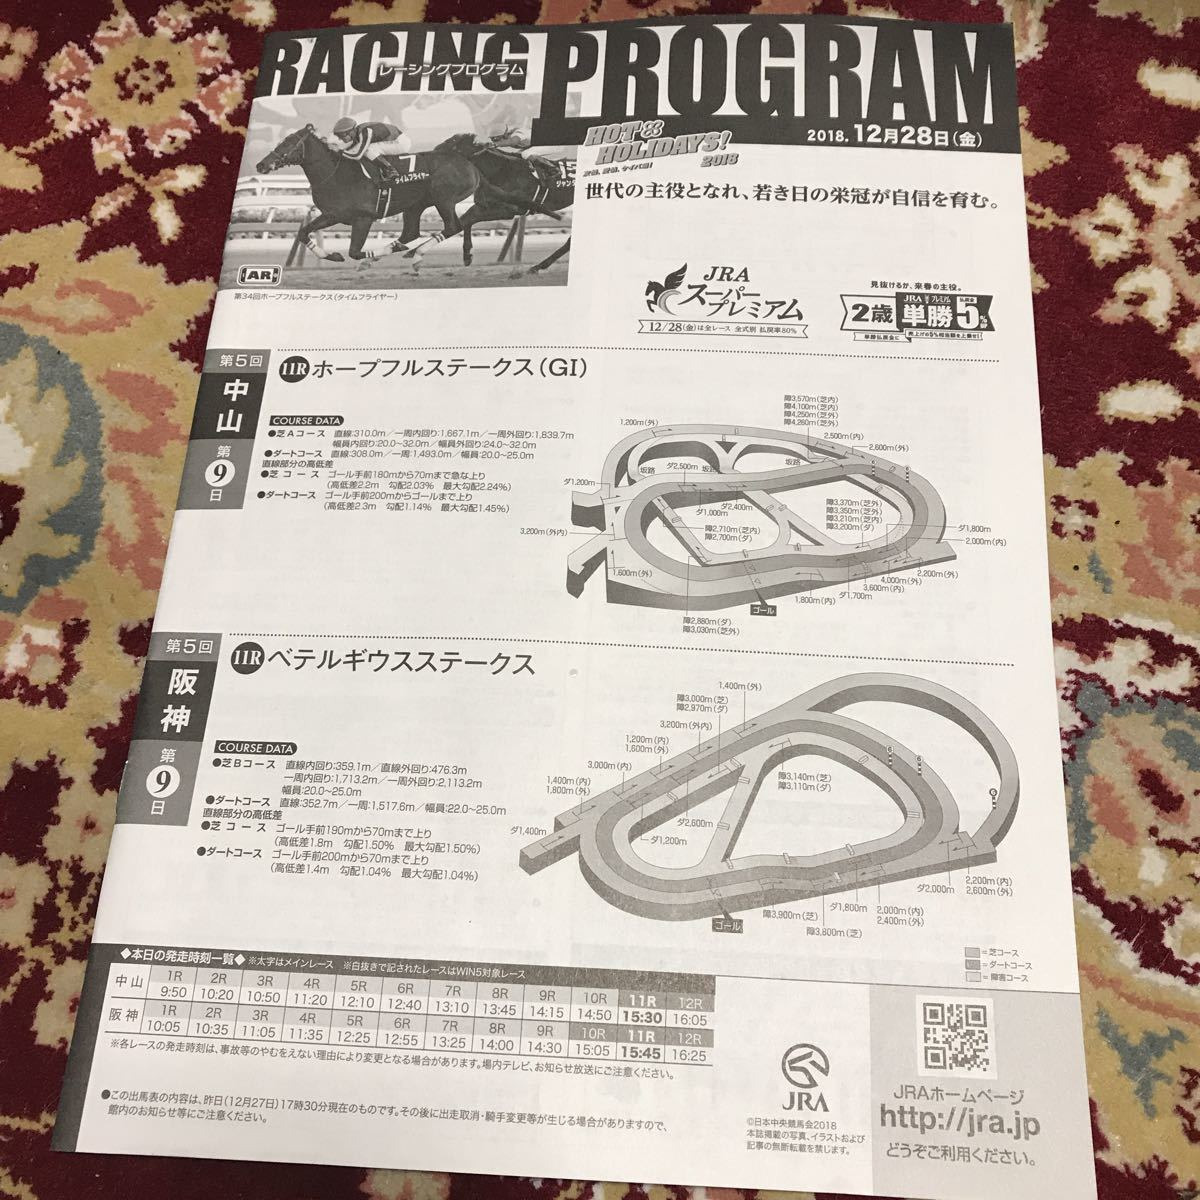 JRAレーシングプログラム2018.12月28日(金)、ホープフルステークス(GⅠ)、ベテルギウスステークス_画像1